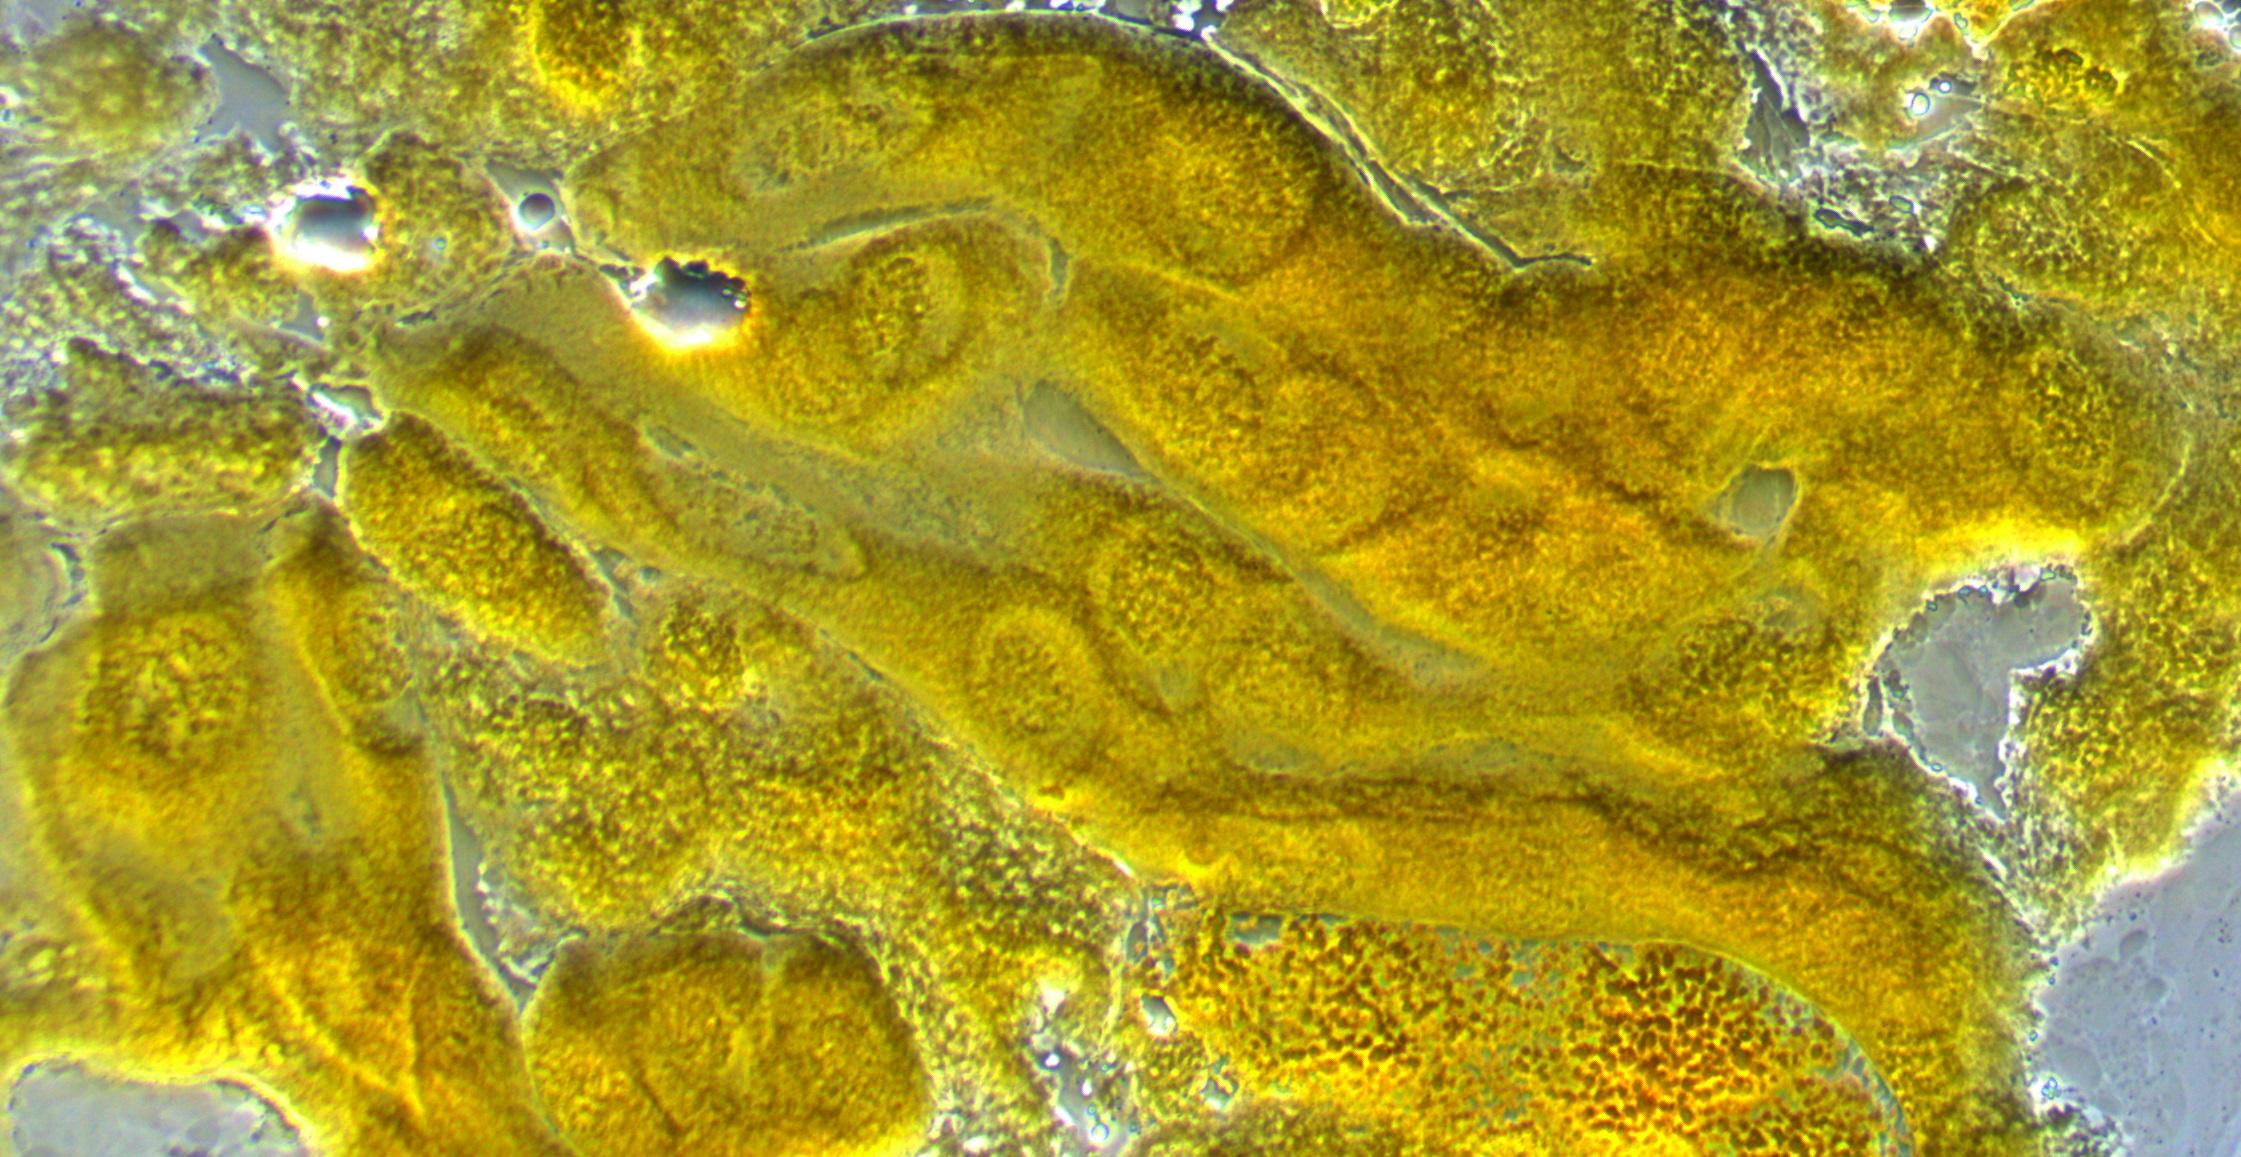 dmel-polytene-2014-07-28-11-55-11-cells